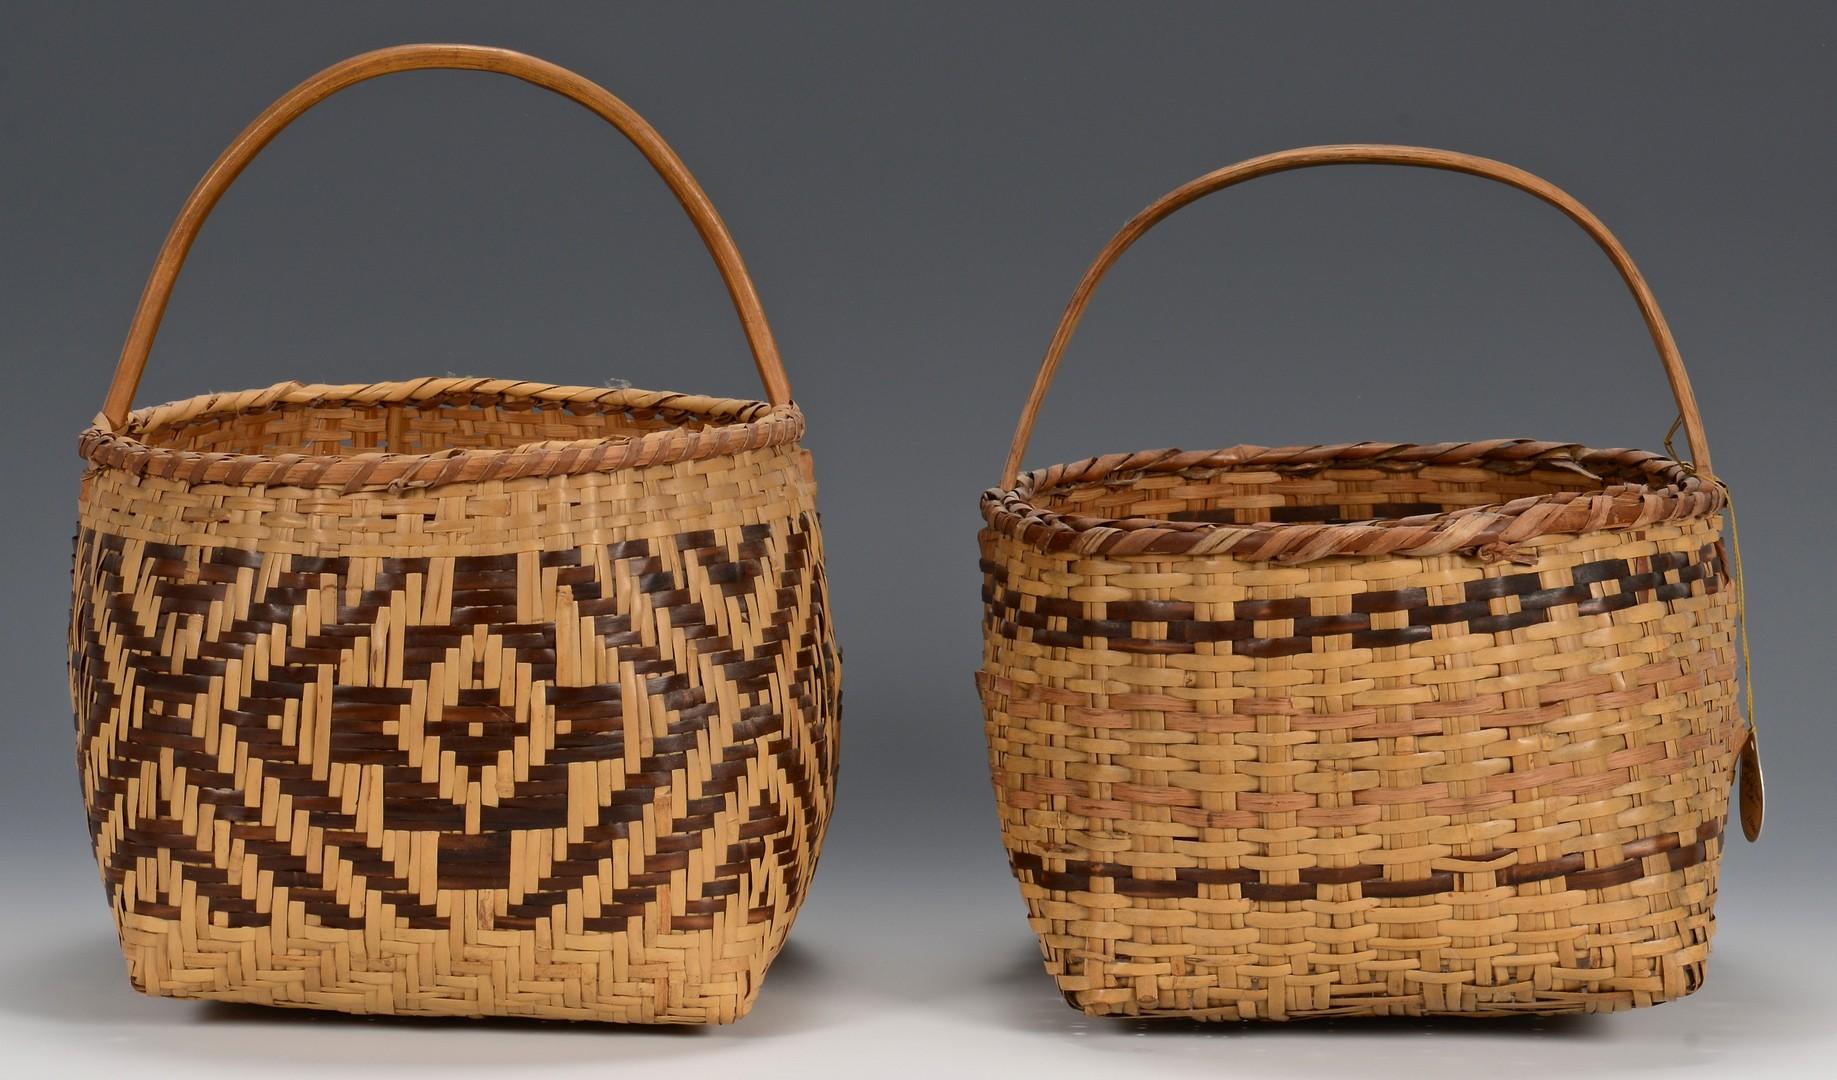 Lot 521: 3 Cherokee River Cane Baskets, 2 w/ handles